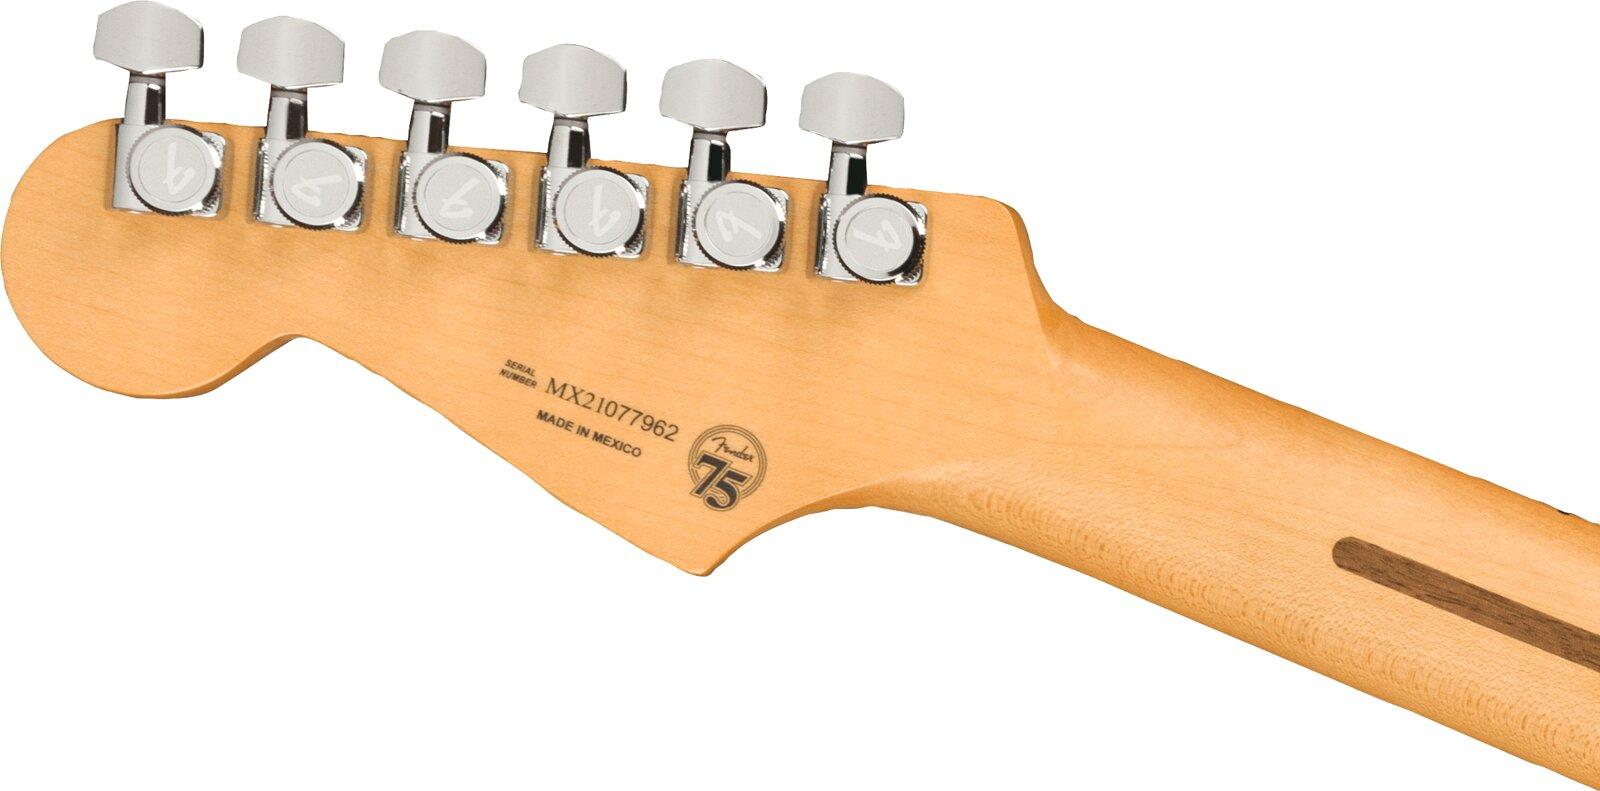 Fender Player Plus Stratocaster HSS, Maple Fingerboard, 3-Color Sunburst : photo 5